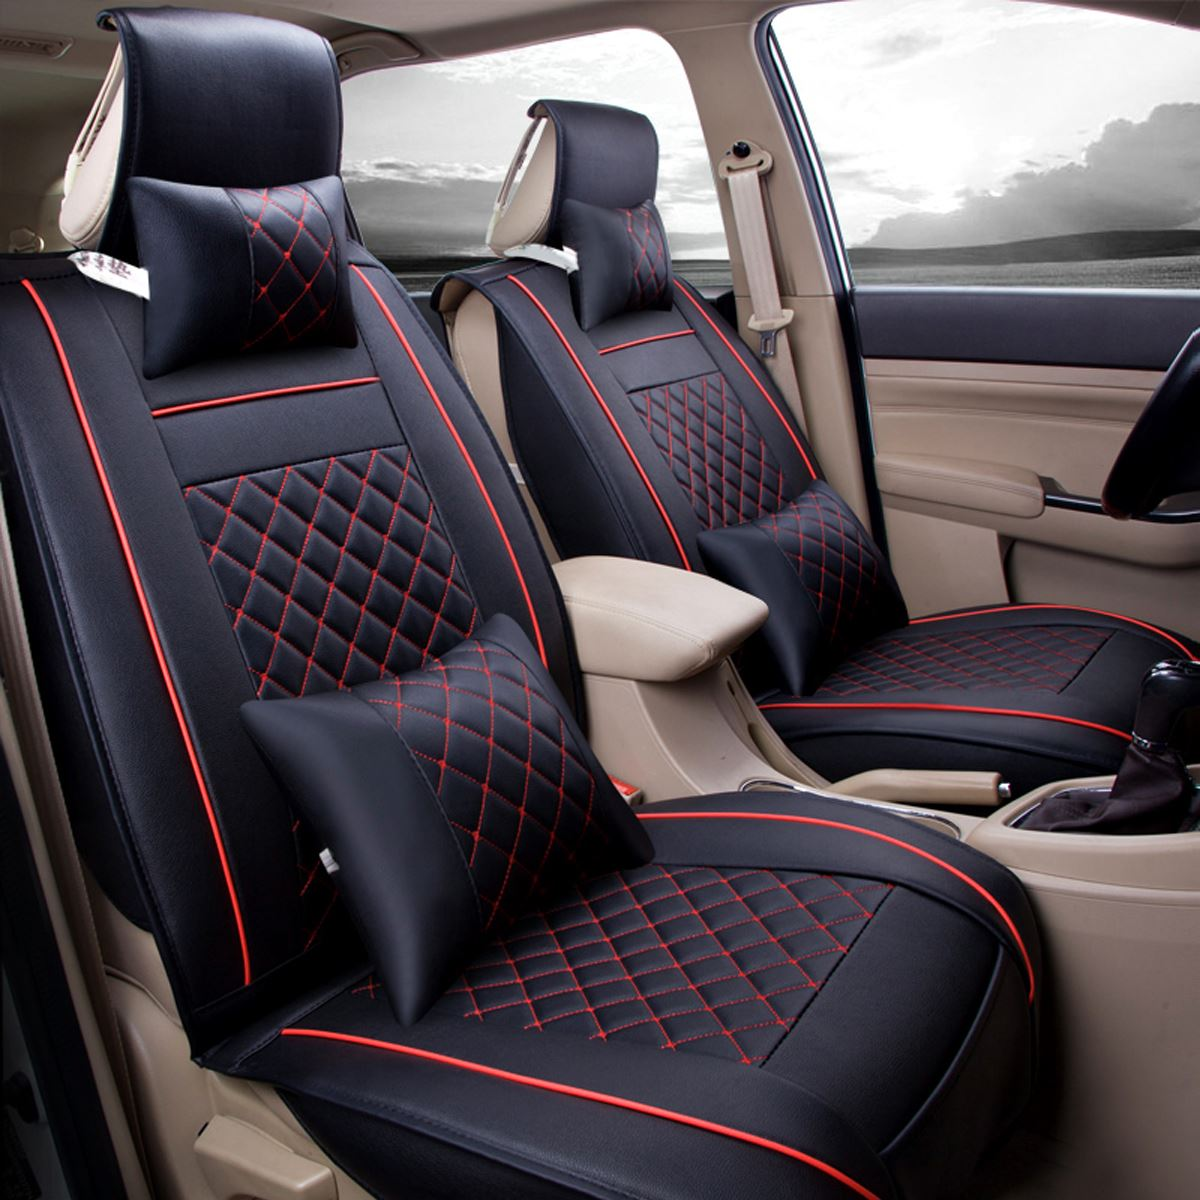 https://ae01.alicdn.com/kf/HTB1h4uJQpXXXXaqXpXXq6xXFXXXA/7-Stks-5-Seat-Auto-Zwart-Rood-Interieur-Voorstoel-Rear-Seat-Cover-Kussen-Set-Auto-interieur.jpg